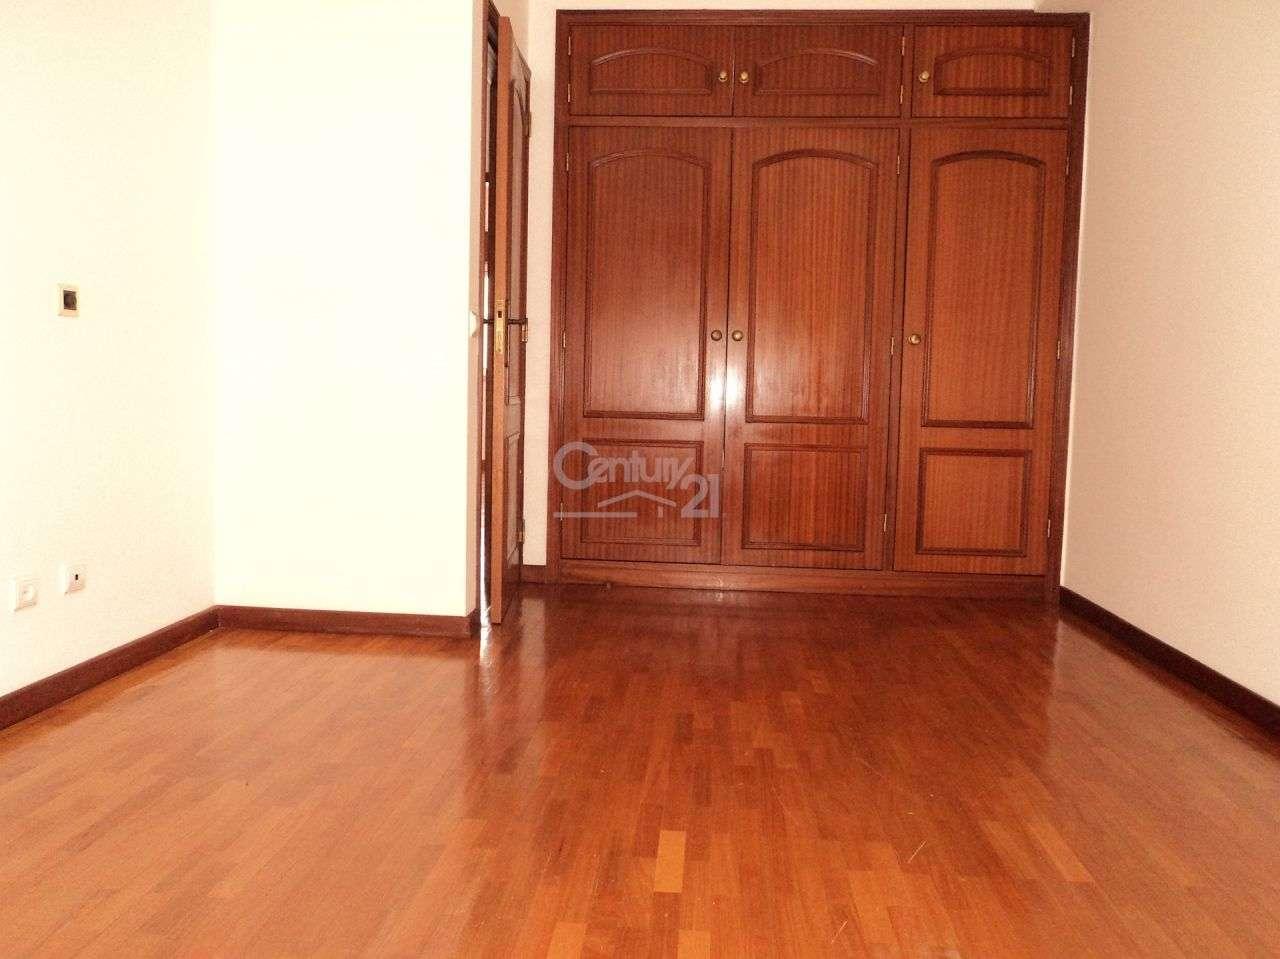 Apartamento para arrendar, Barcarena, Lisboa - Foto 8